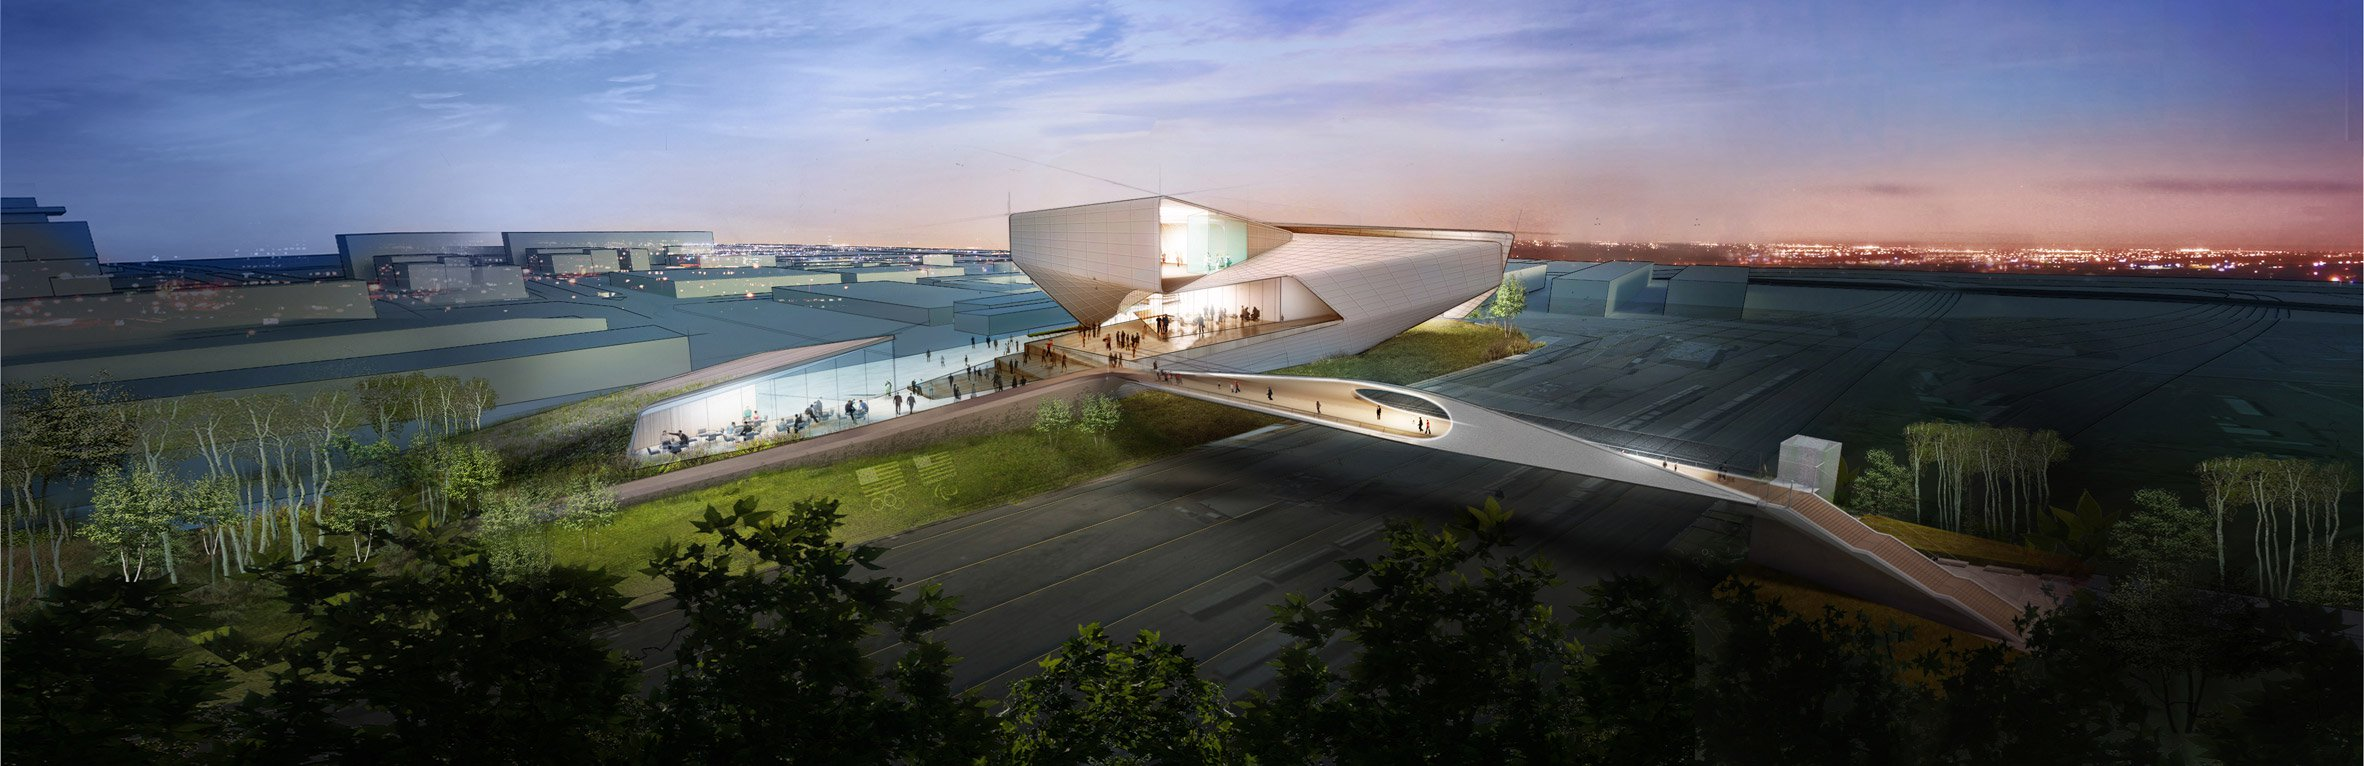 Diller Scofidio + Renfro's US Olympic Museum breaks ground